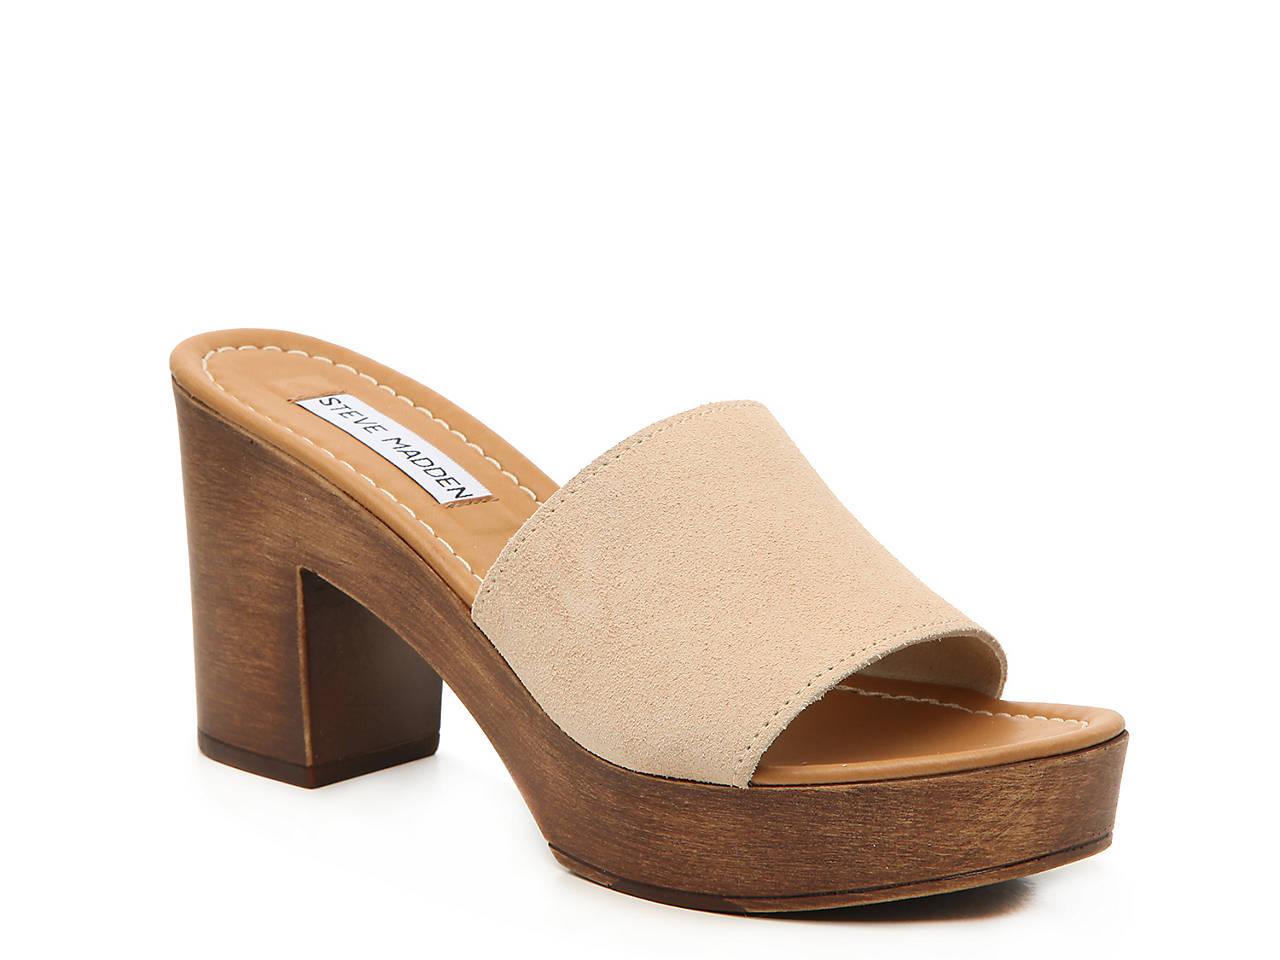 0bf6be1c403 Fran Platform Sandal